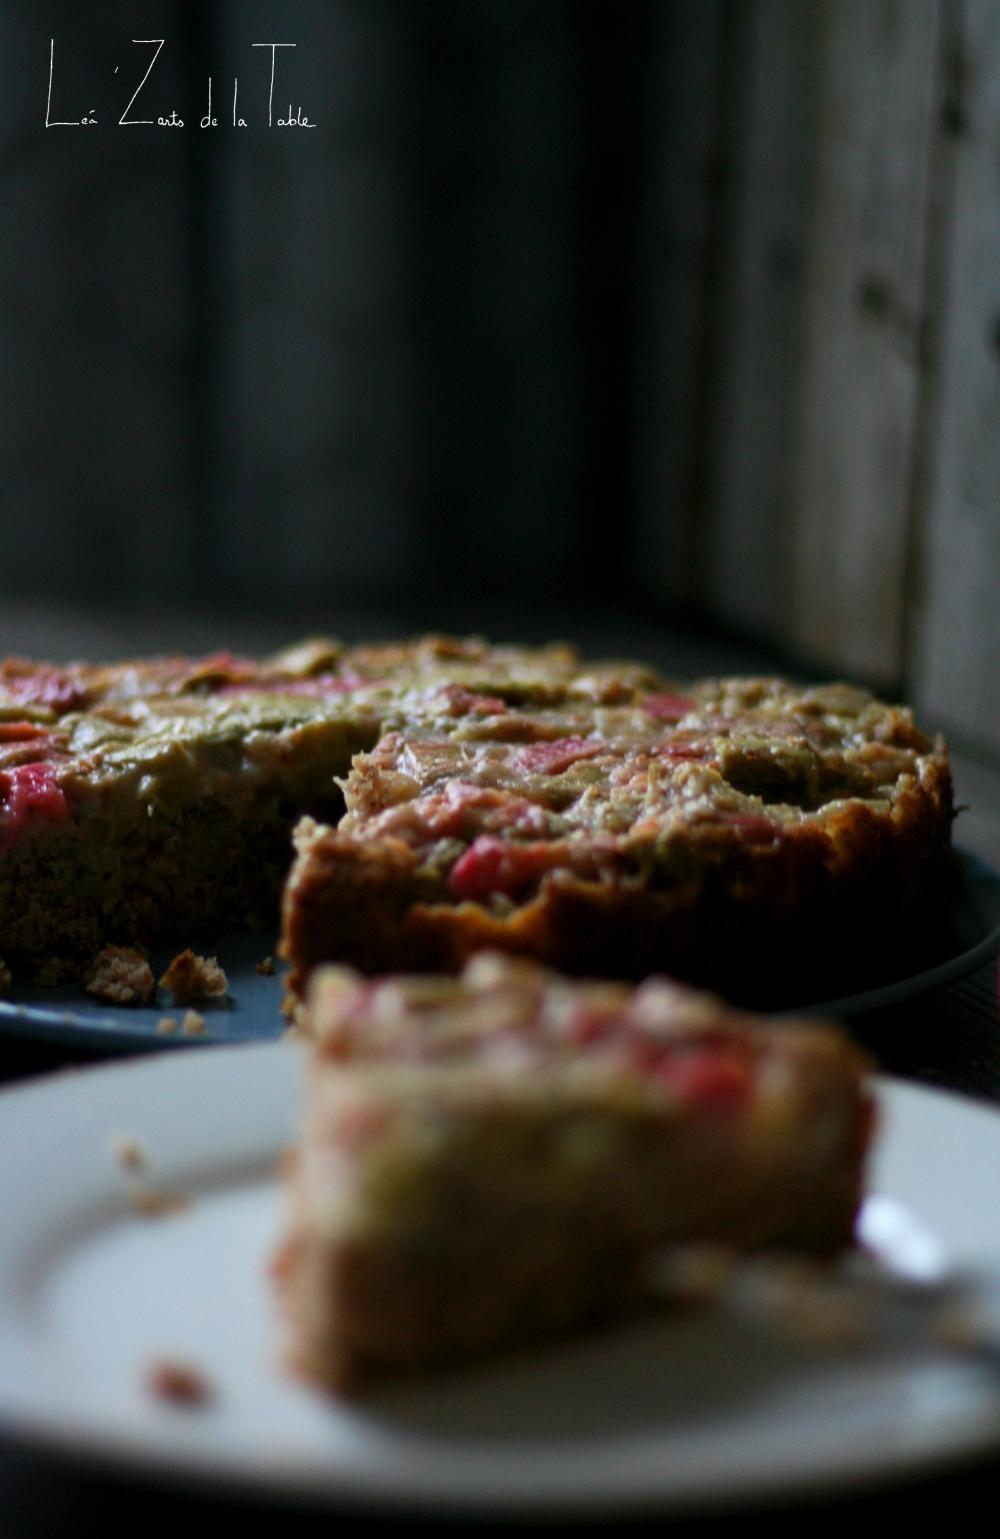 04-gâteaurhubarbe